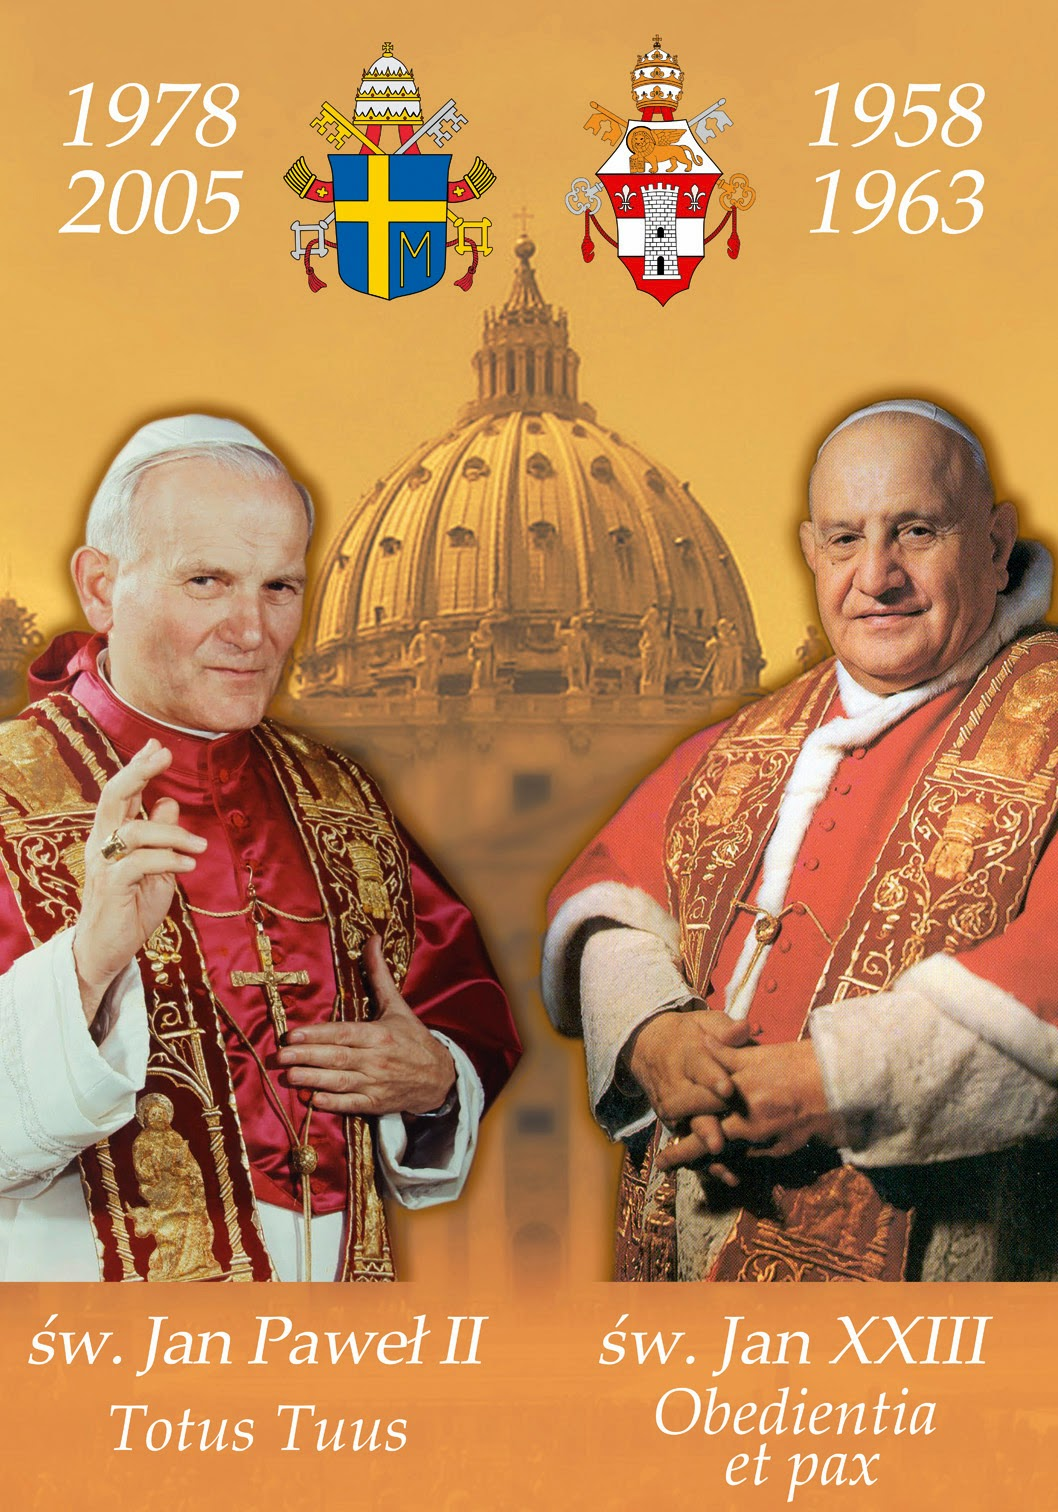 Два Папи, одна епоха